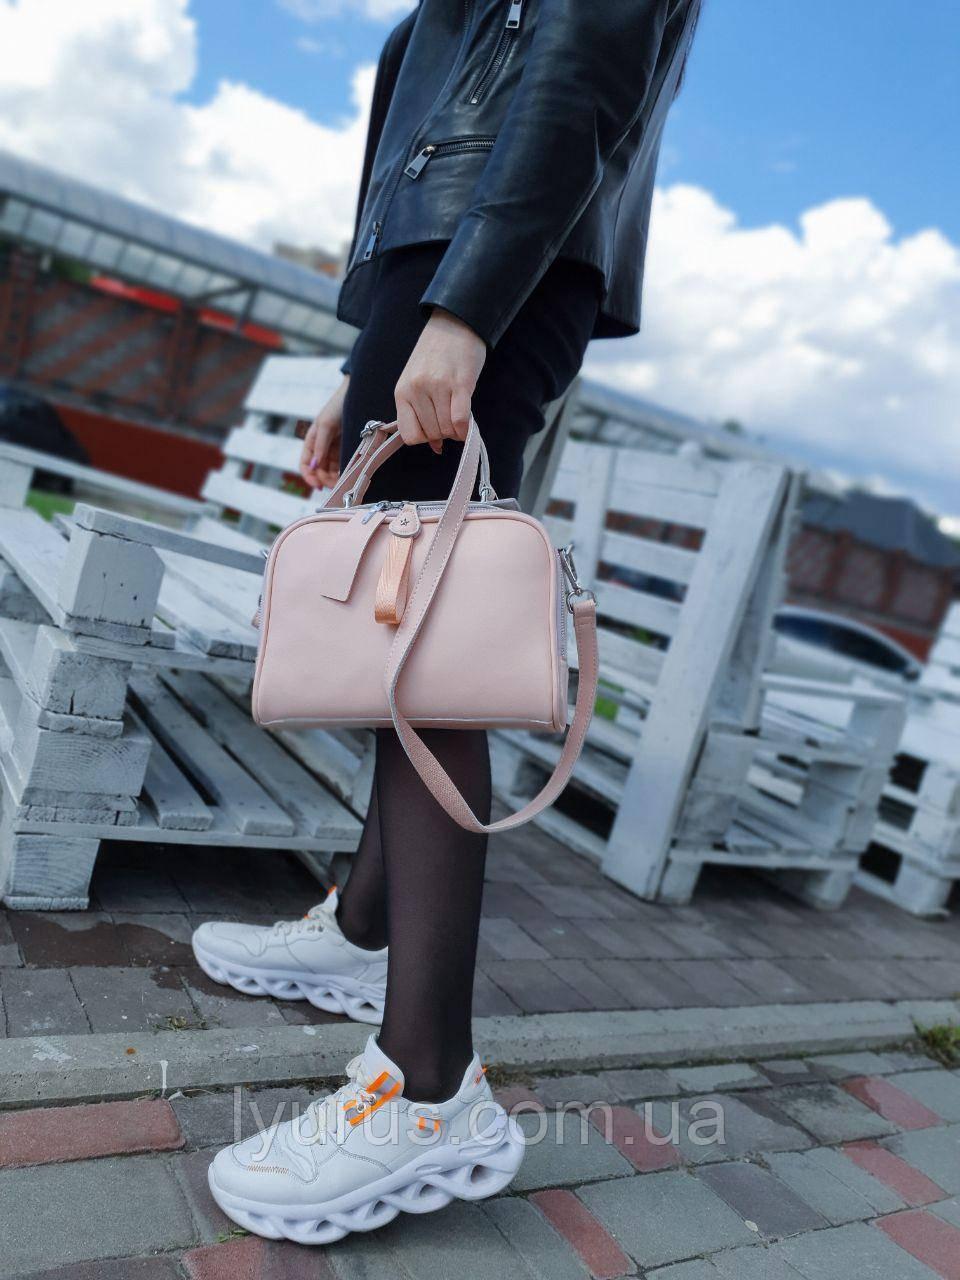 Женская кожаная сумка размером 26х20х11 см Светло-розовая (01219)